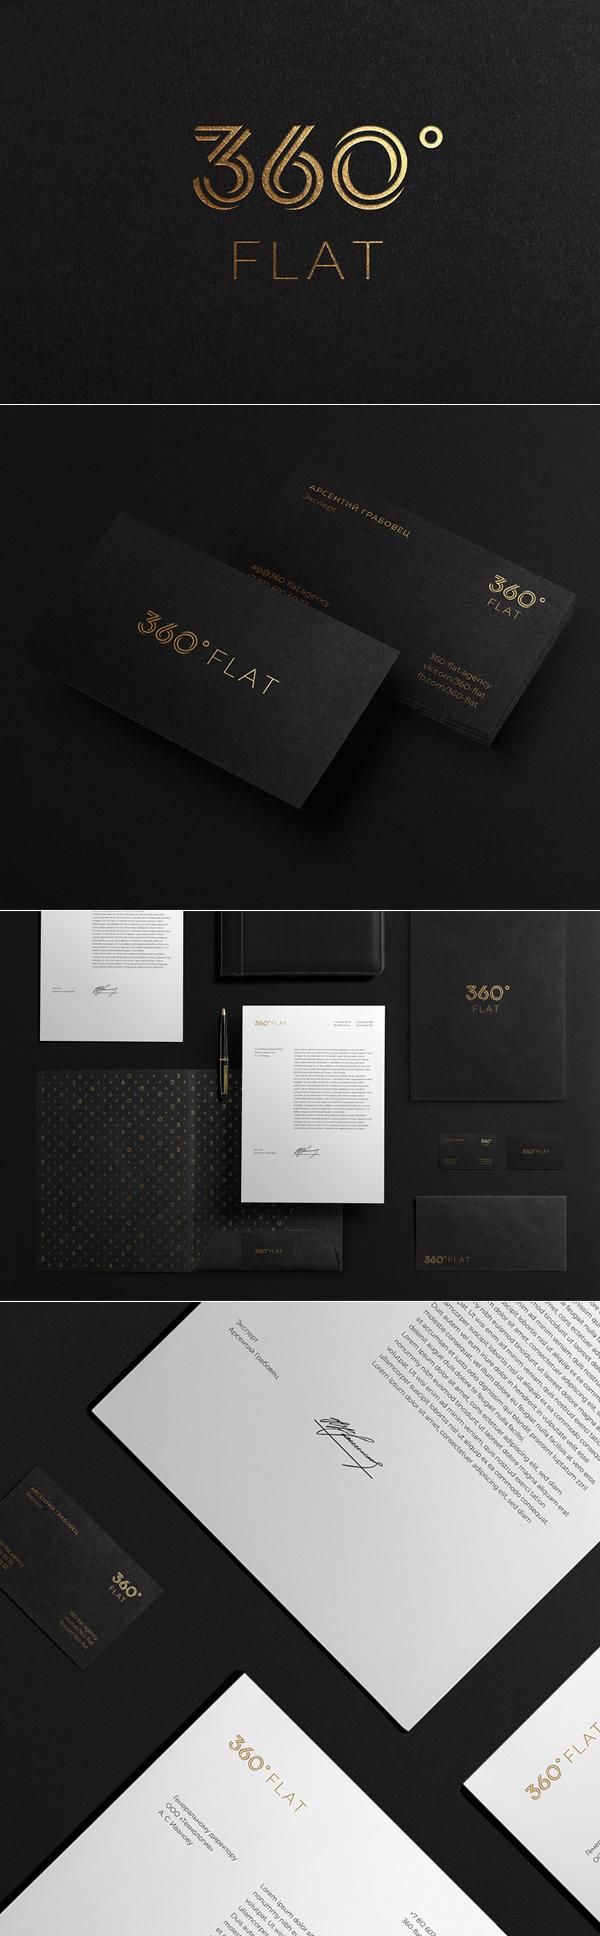 360° Flat Branding Identity by Sergey Dergachenko